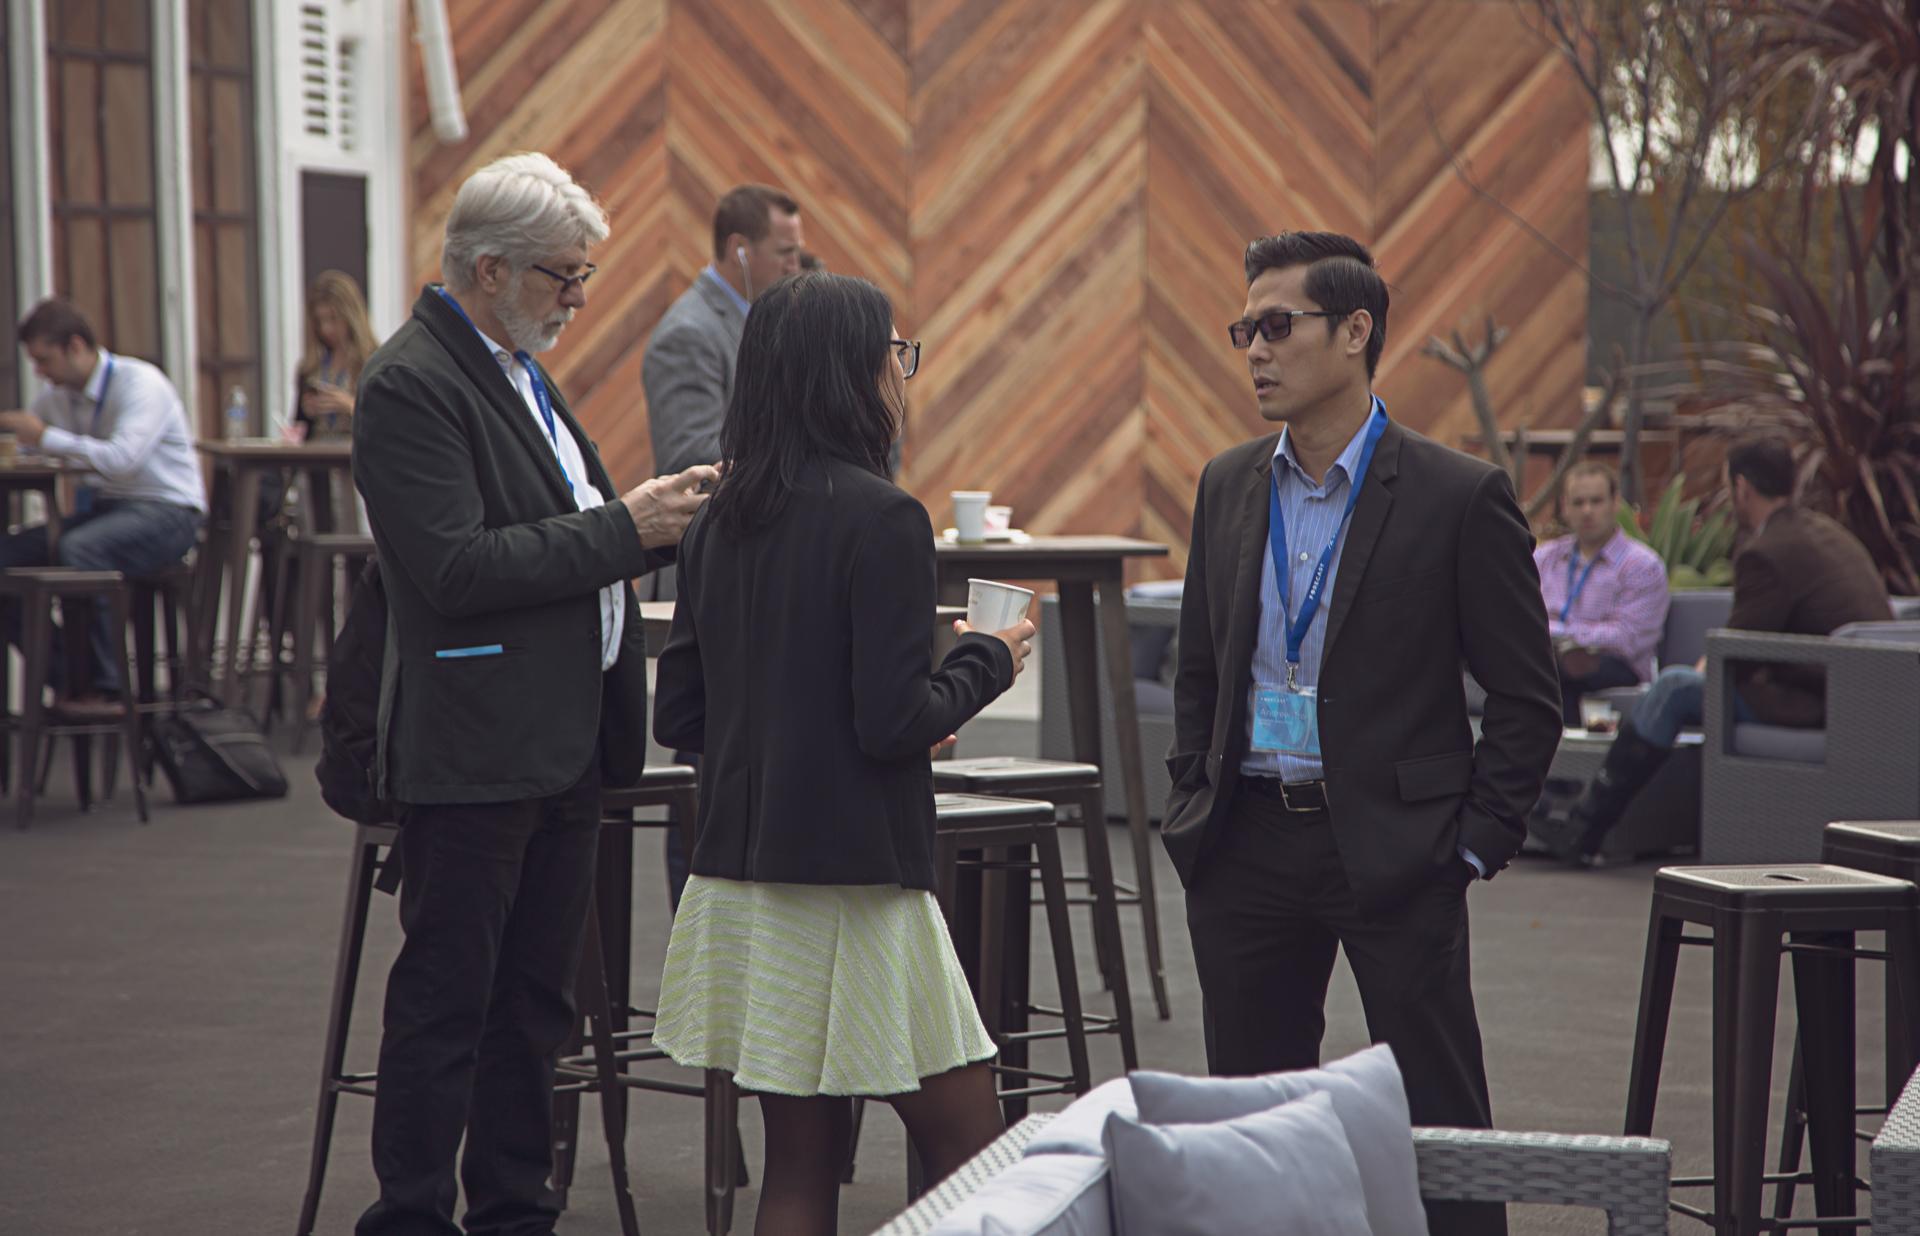 people-talking-outside-base-forecast-conference-san-francisco-patrick-sanders.jpg